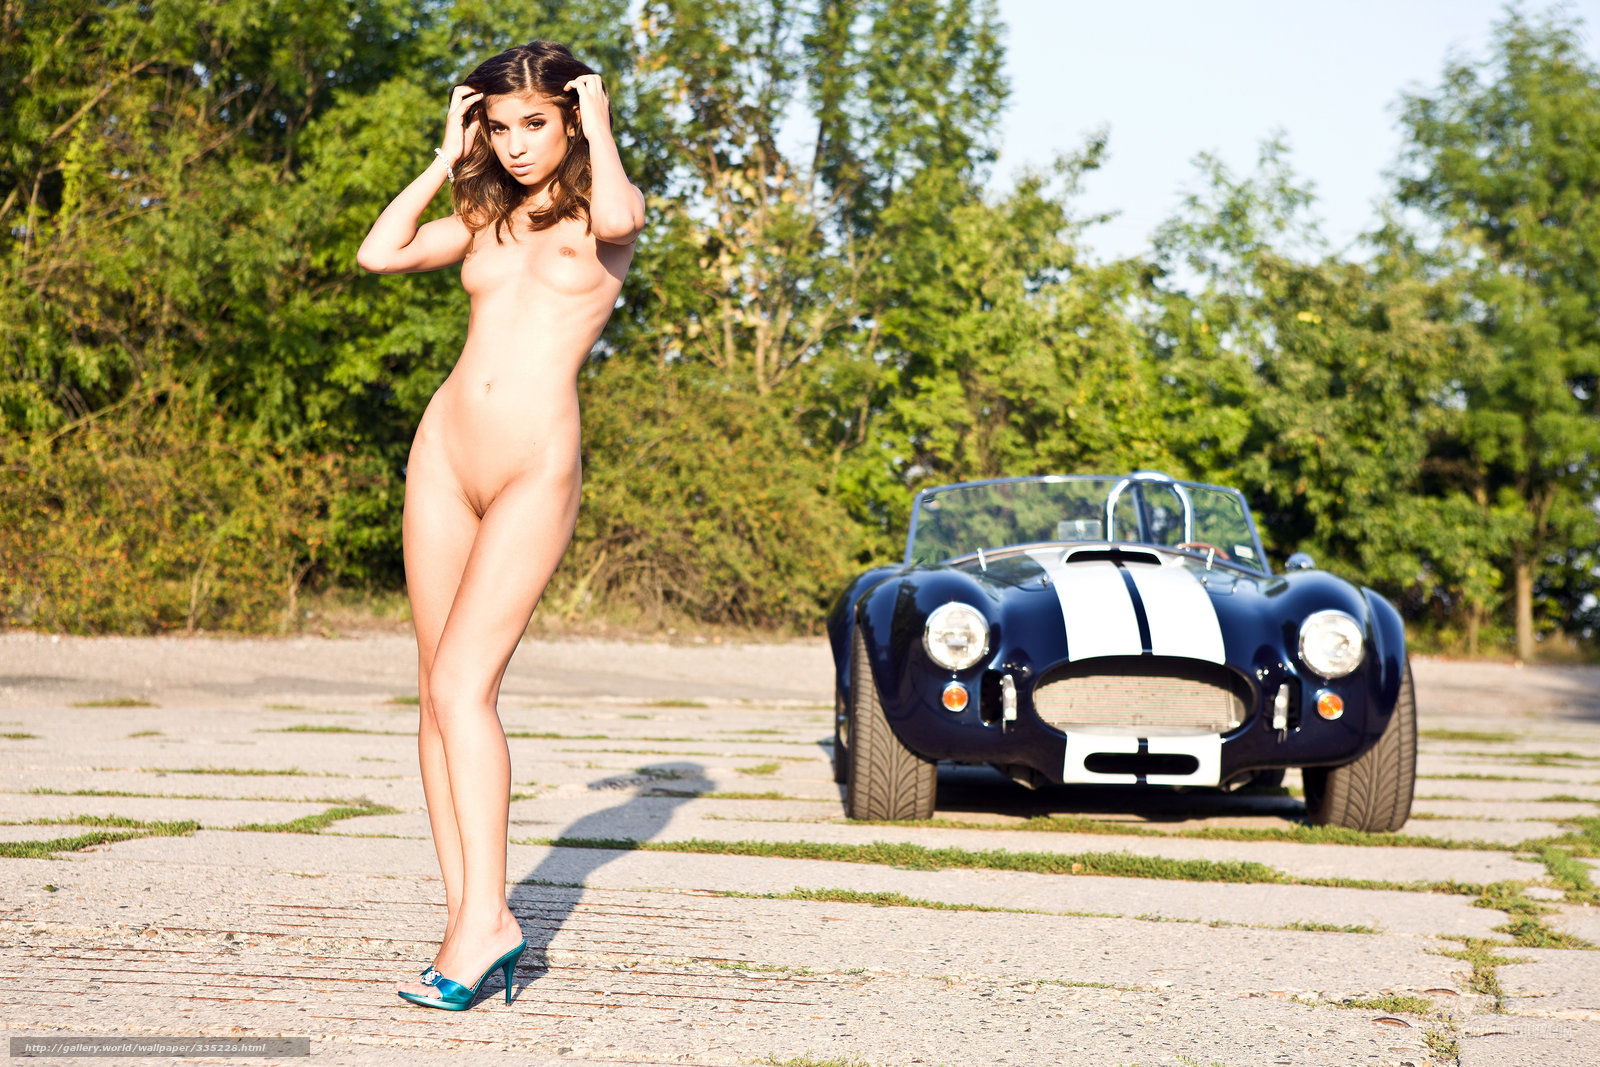 Теги. еротика топ-модели. еротика фотомодели. erotic wallpapers